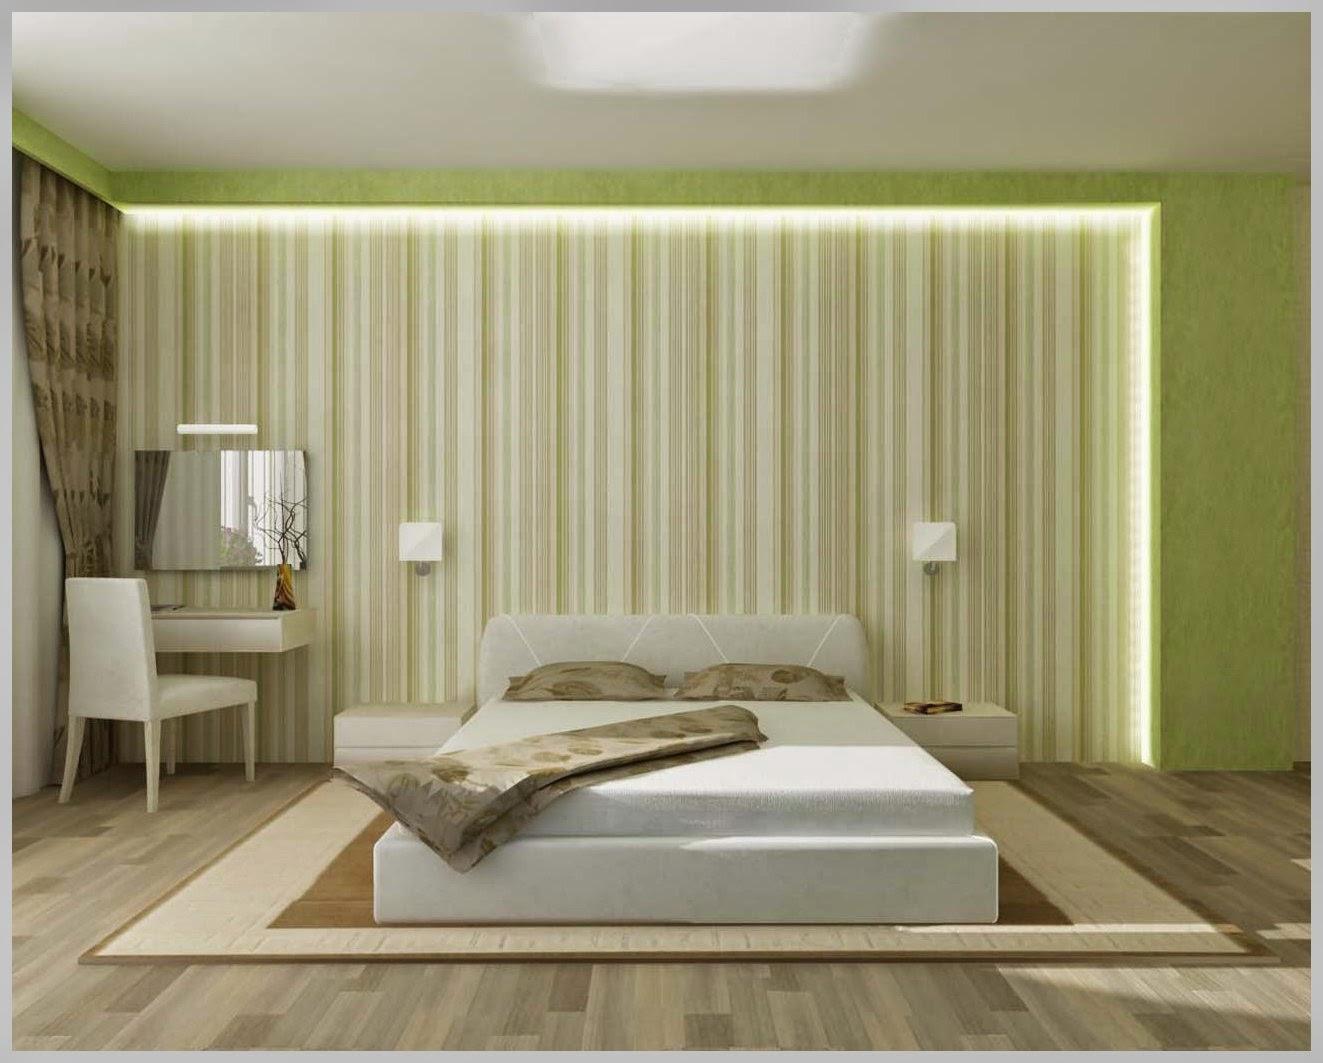 Alimustang home design future interior design allhitecture - Future home interior design ...